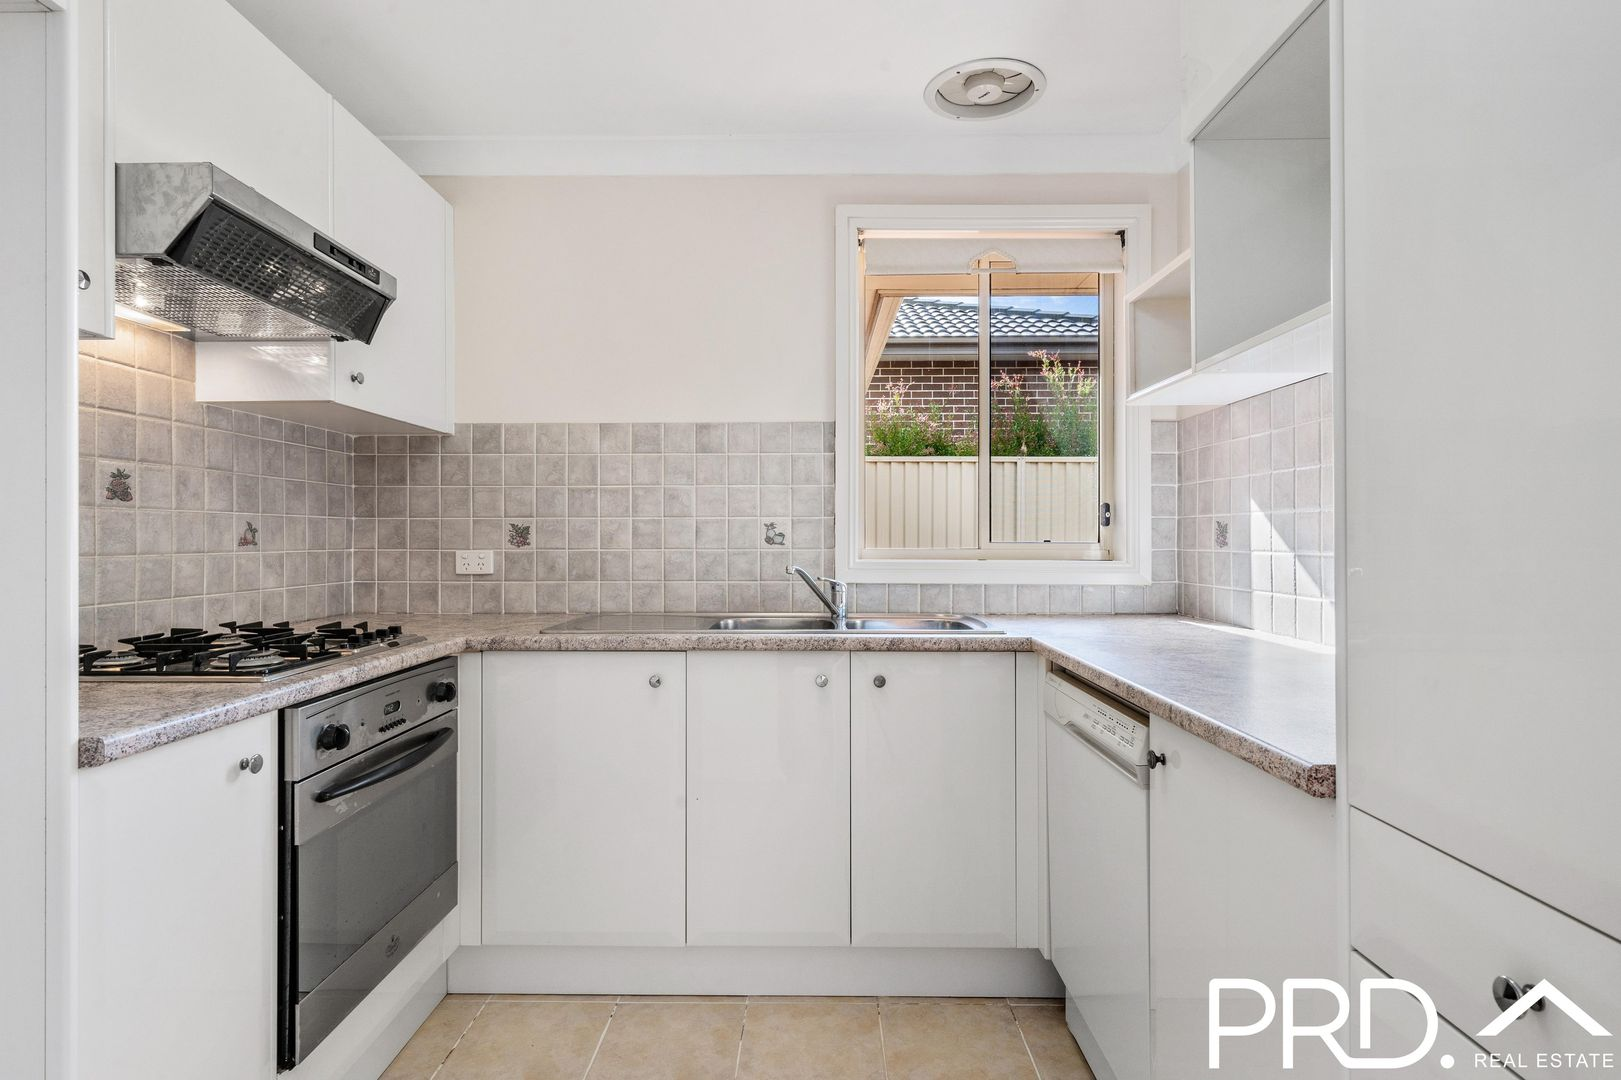 3/777-779 Forest Rd, Peakhurst NSW 2210, Image 2